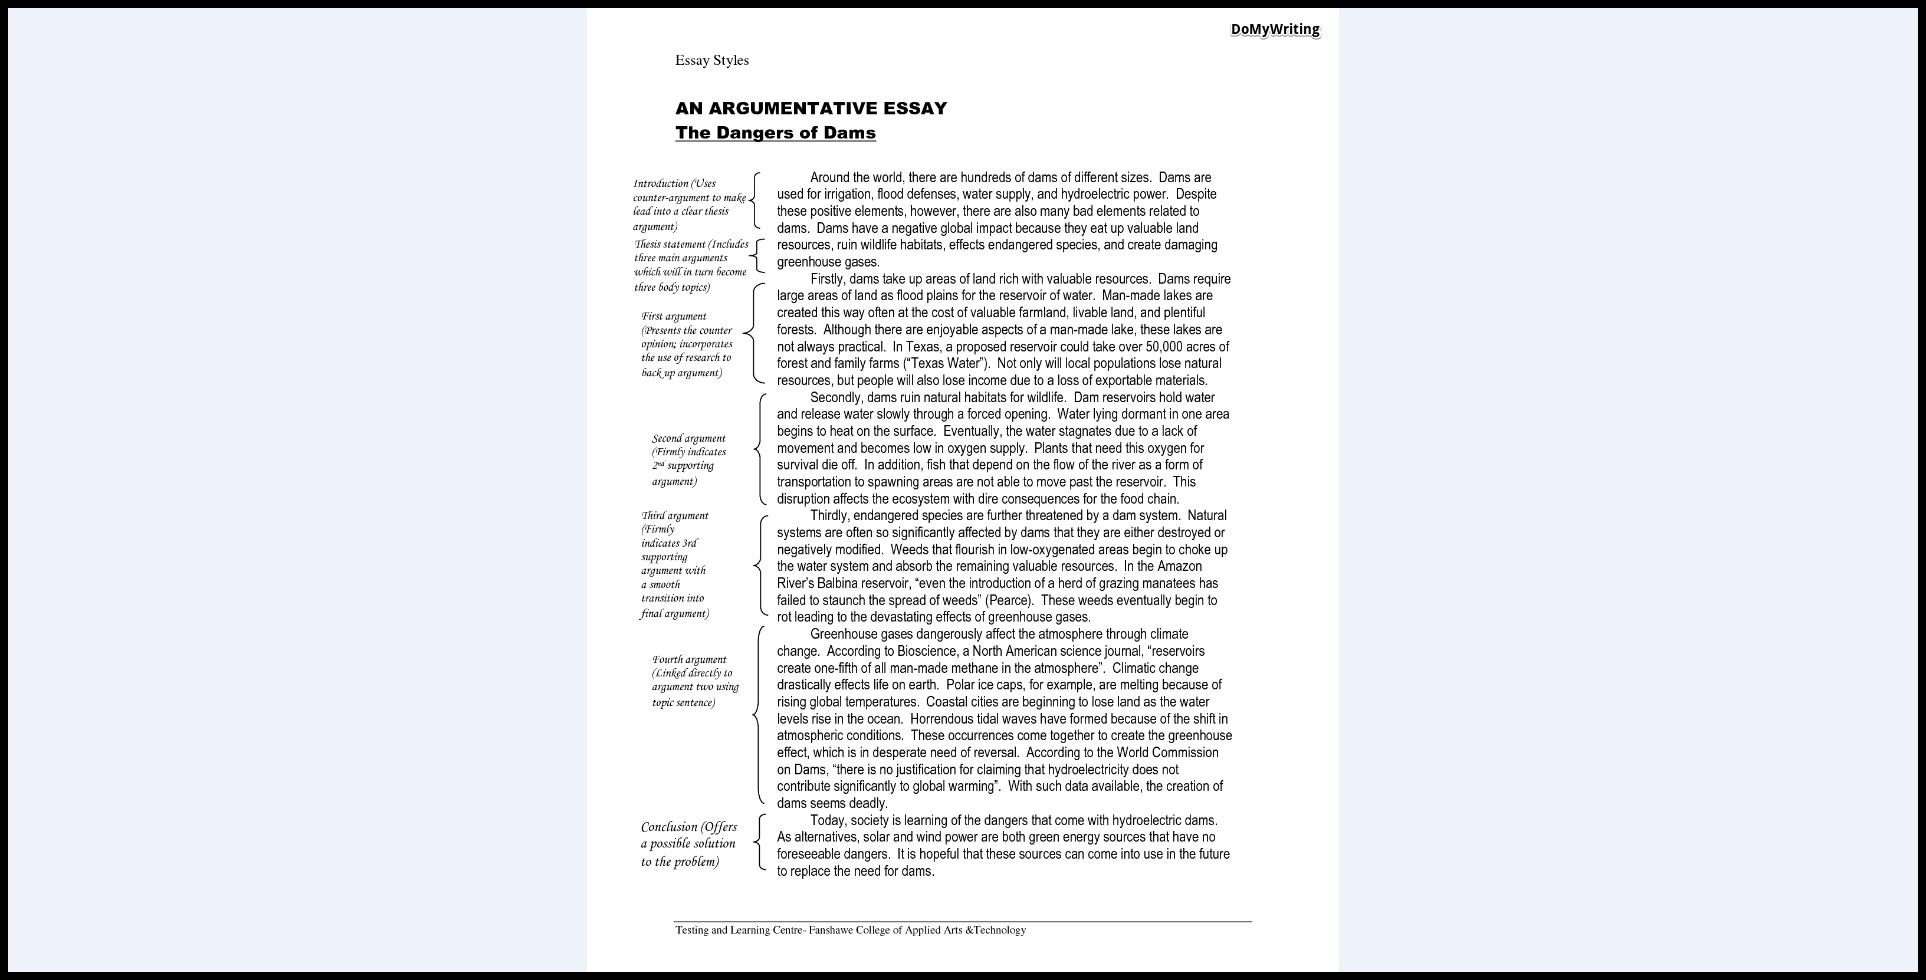 010 Essay Example Controversial Argumentative Topics Excellent Non Current Full